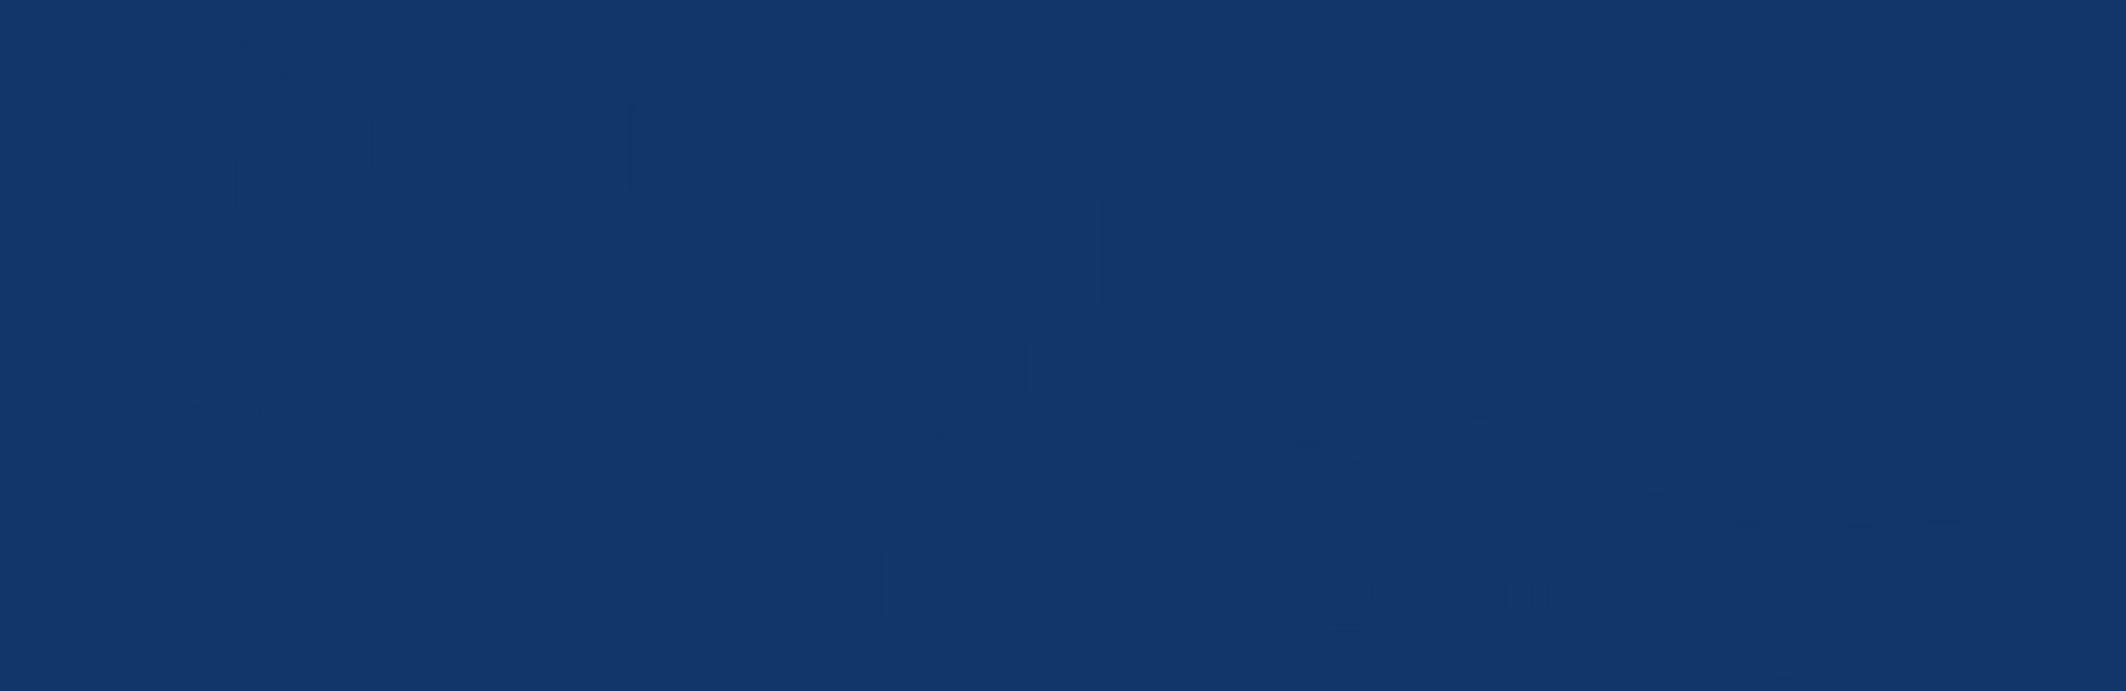 Logo: GEBEWO - Soziale Dienste - Berlin gGmbH